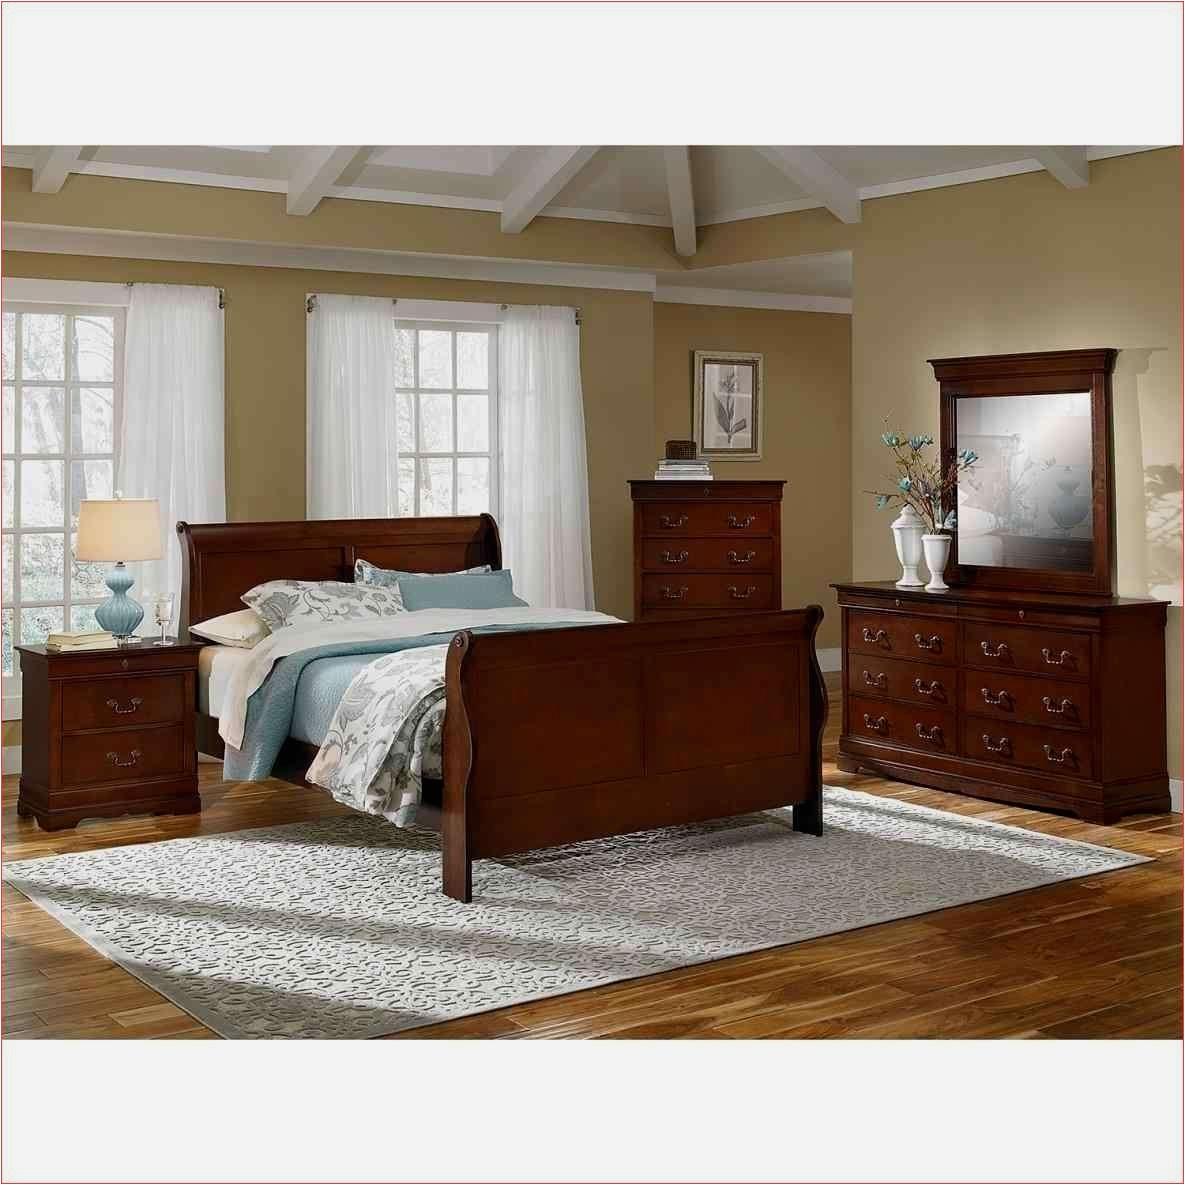 used furniture sale sacramento best of 43 best craigslist sacramento furniture free stock images of used